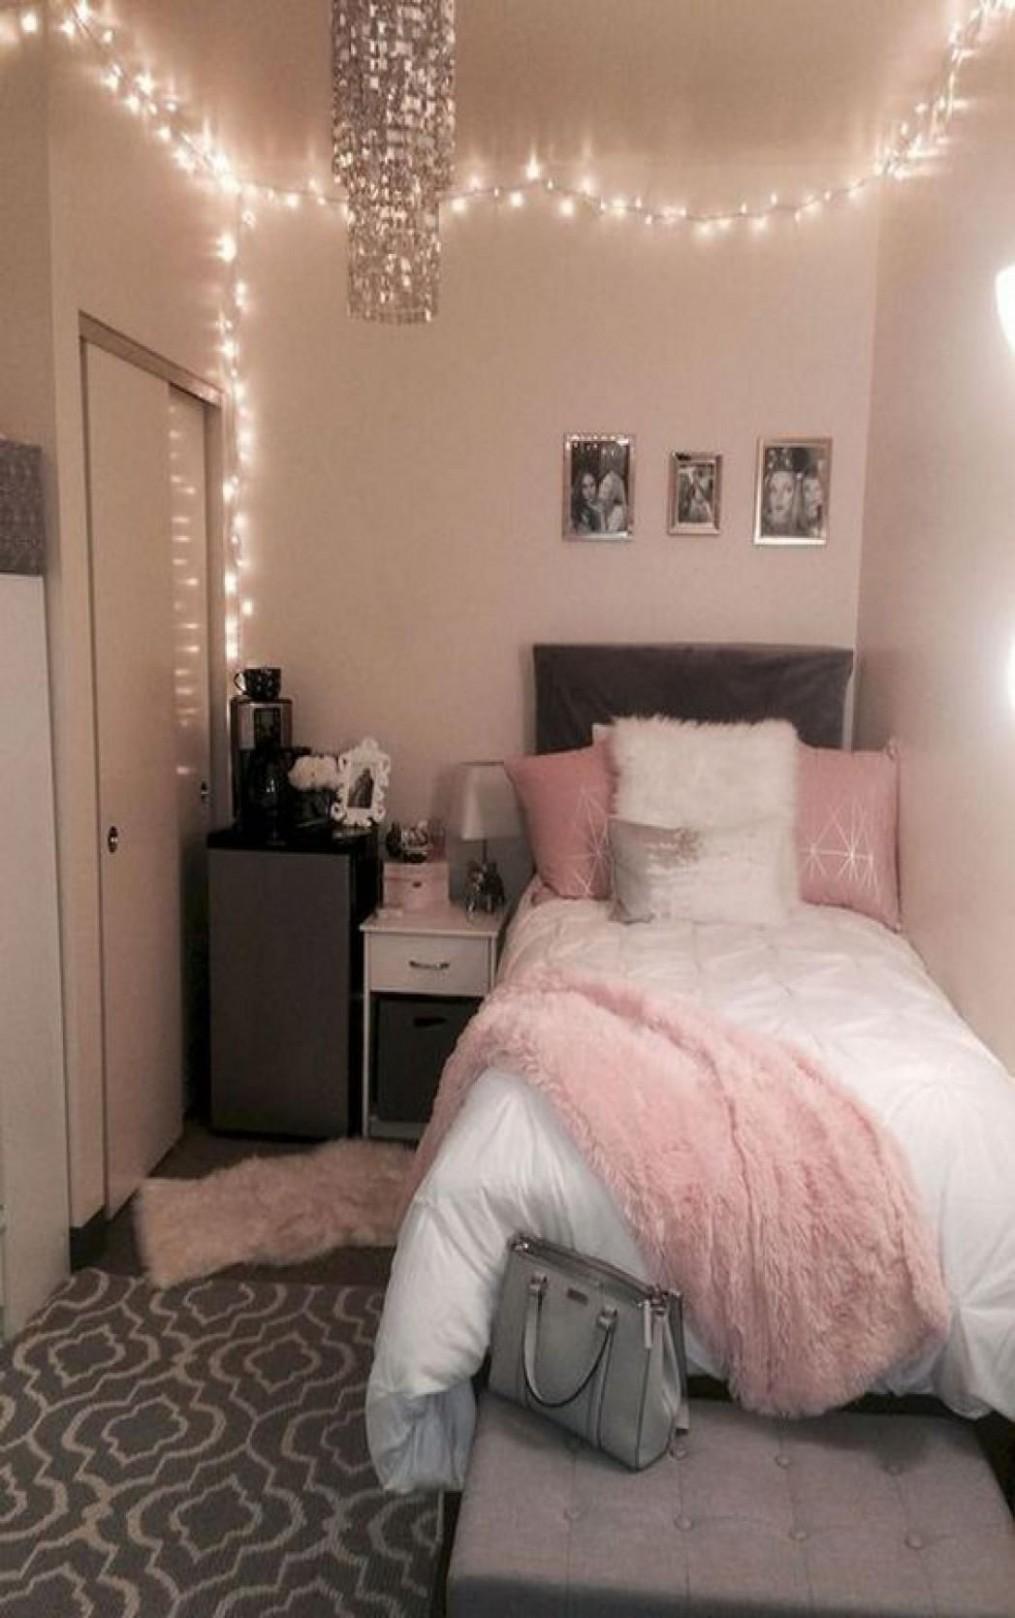 11 Most Popular Apartment Bedroom Design Ideas in 11  Dorm room  - Bedroom Ideas Apartment